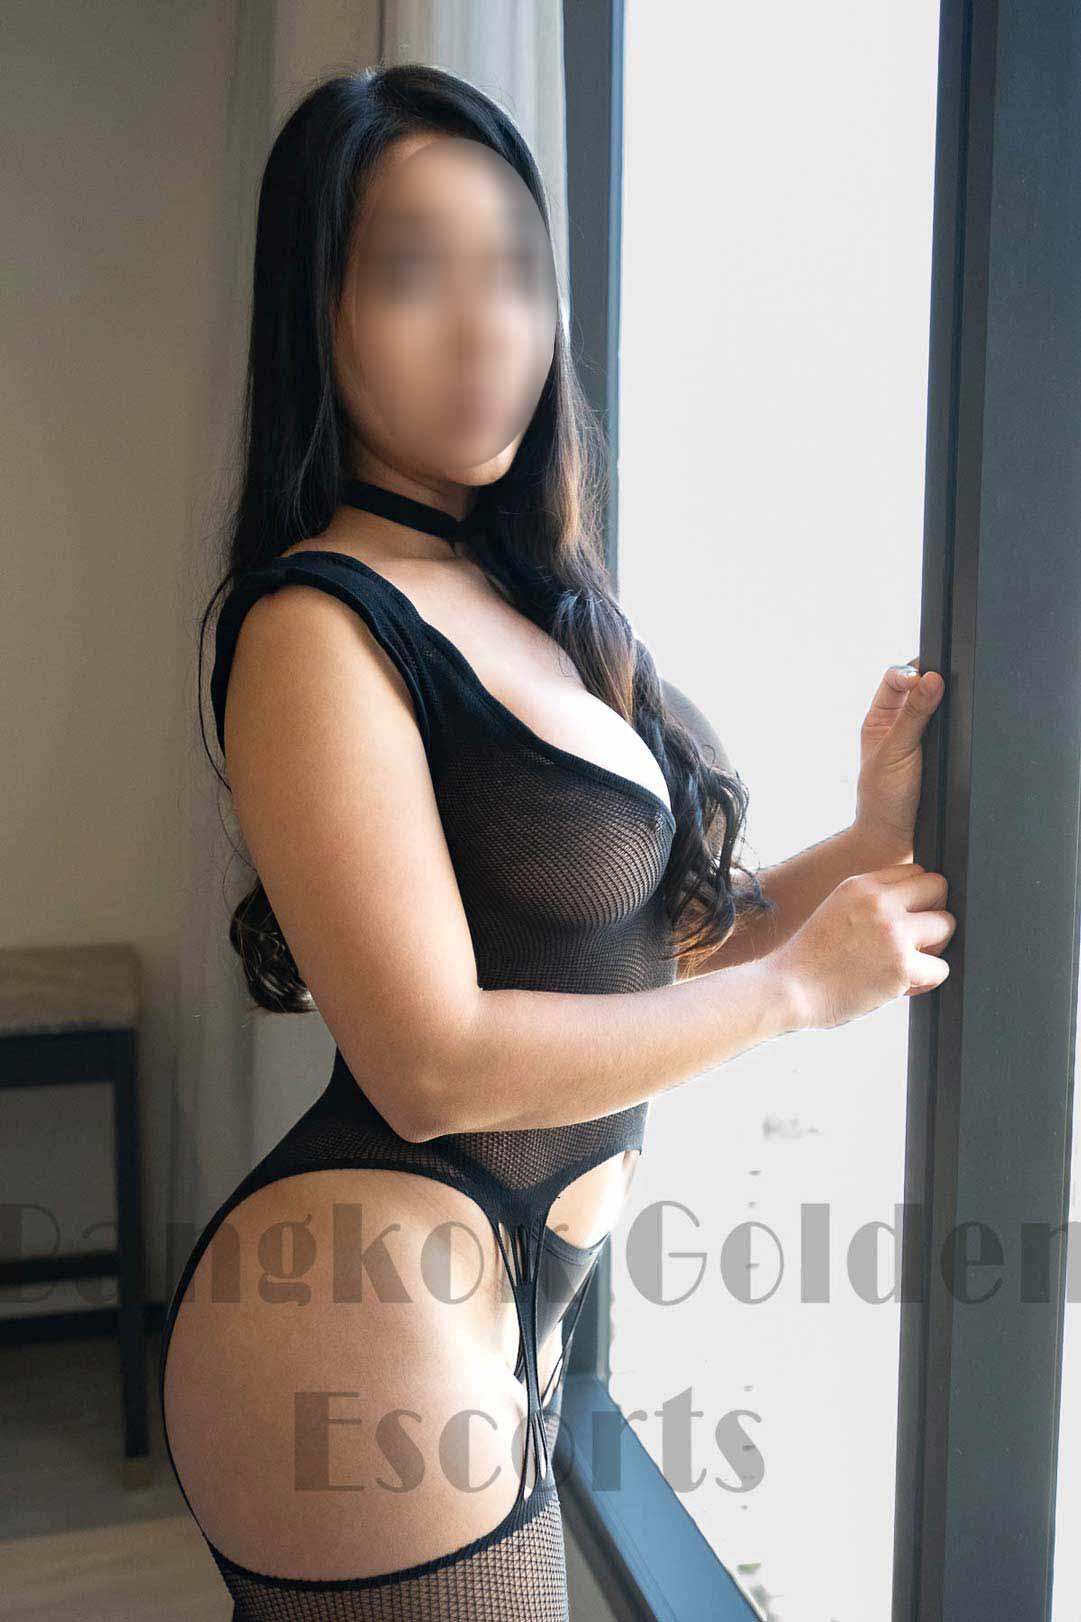 Escorts Services In Thailand